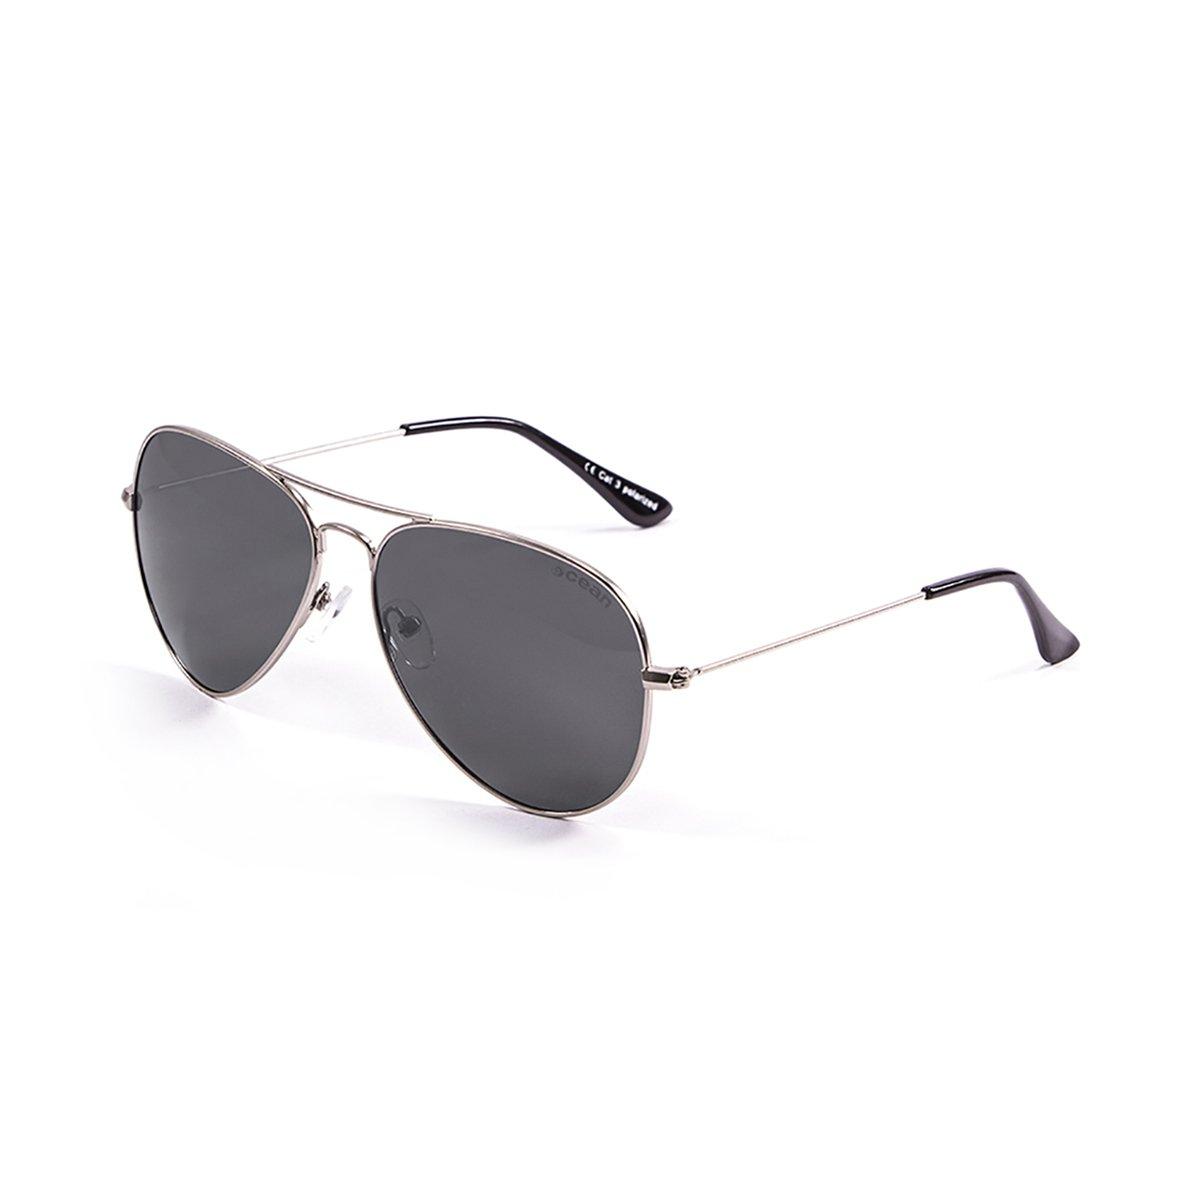 Ocean Sunglasses Banila aviator - lunettes de soleil en Métal - Monture : Argent - Verres : Fumée (18110.2) vJVHoO